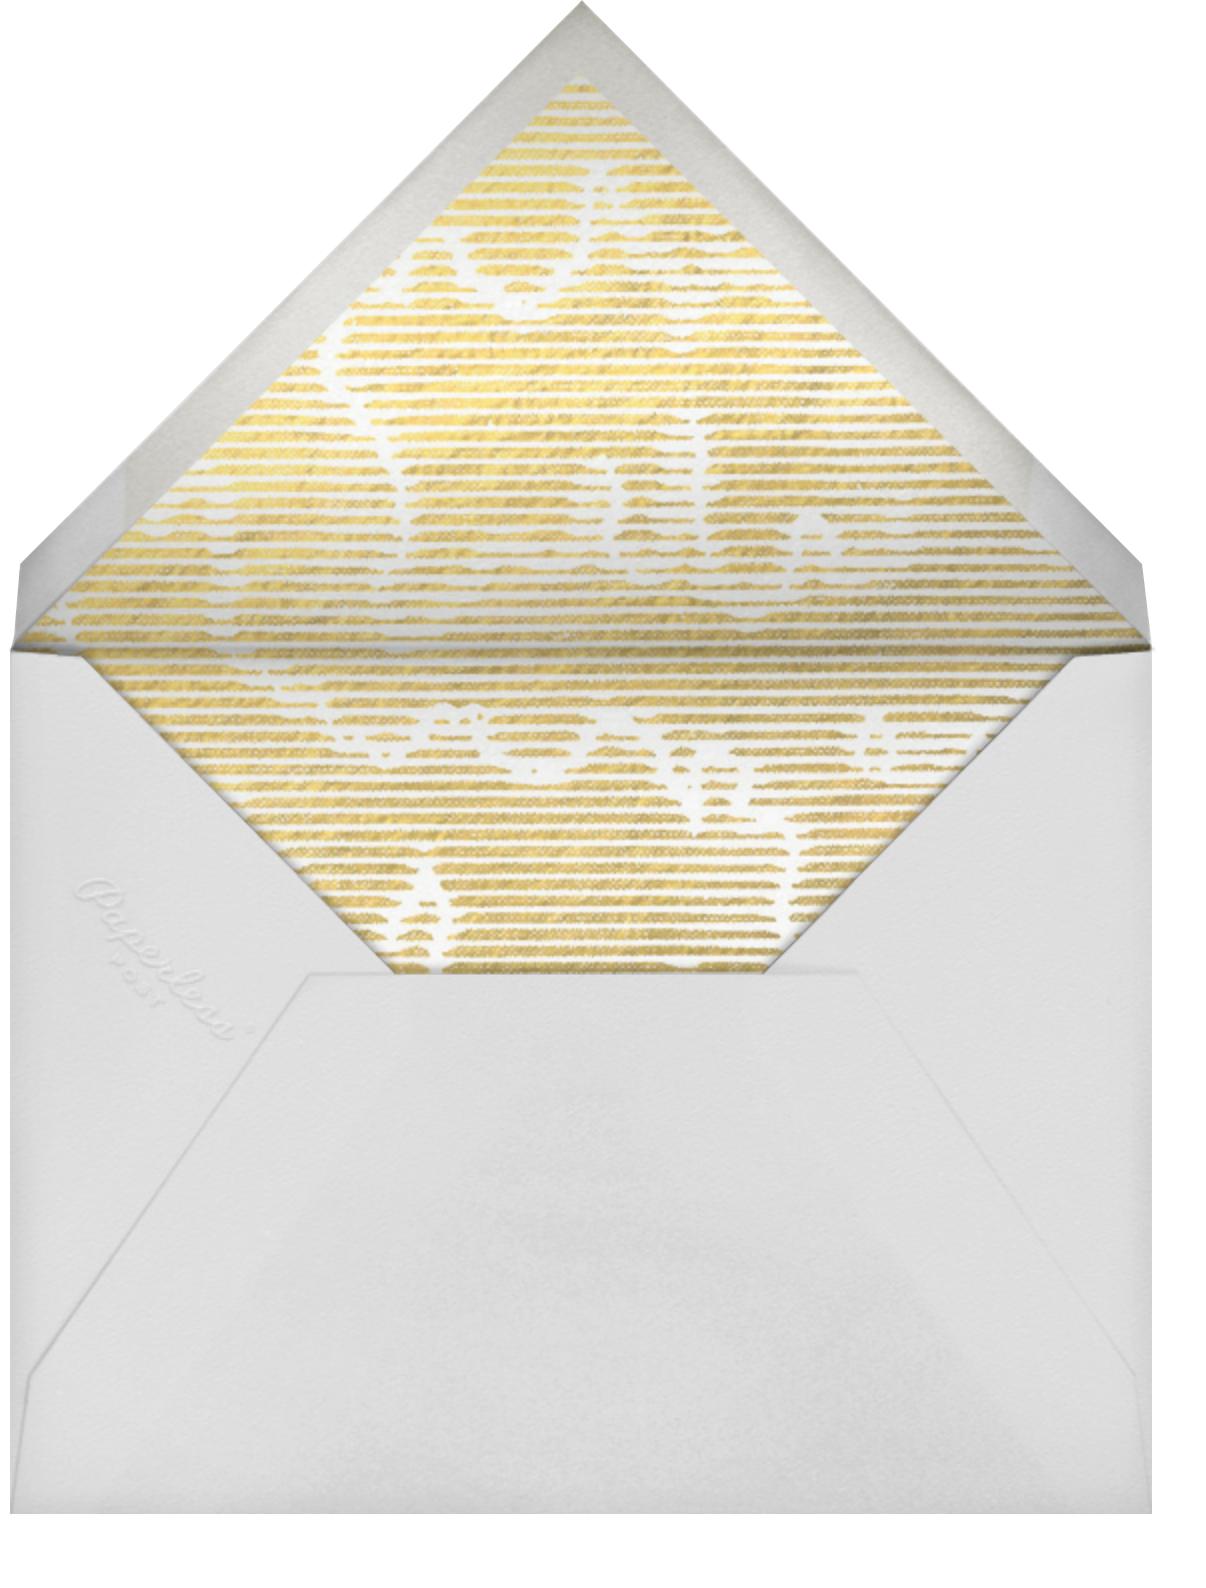 Acclaim - Kelly Wearstler - Mother's Day - envelope back